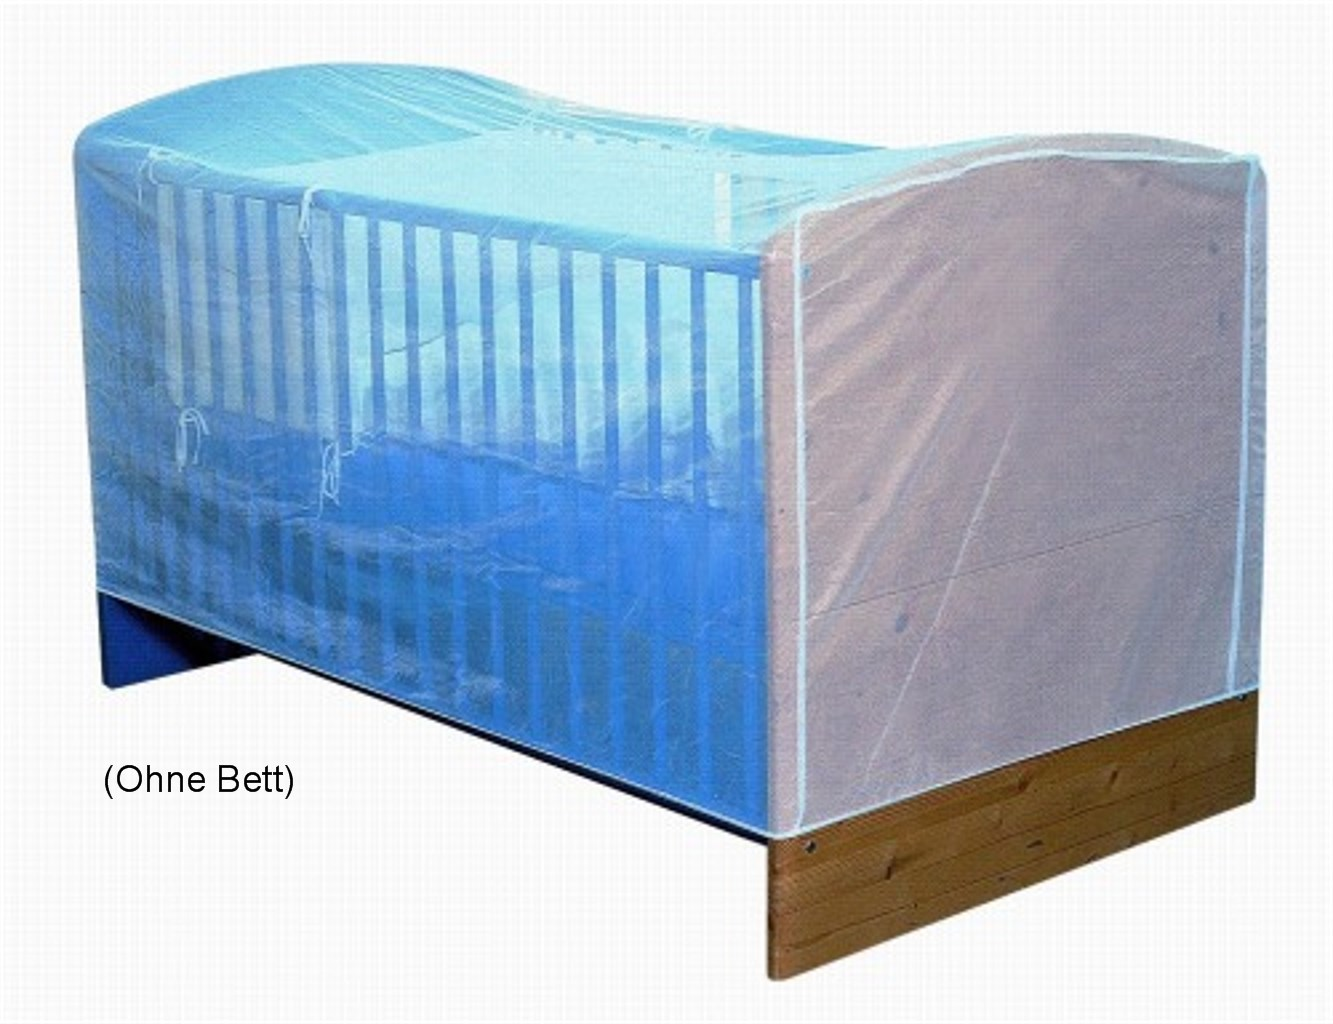 insektenschutz kinderbett wei. Black Bedroom Furniture Sets. Home Design Ideas